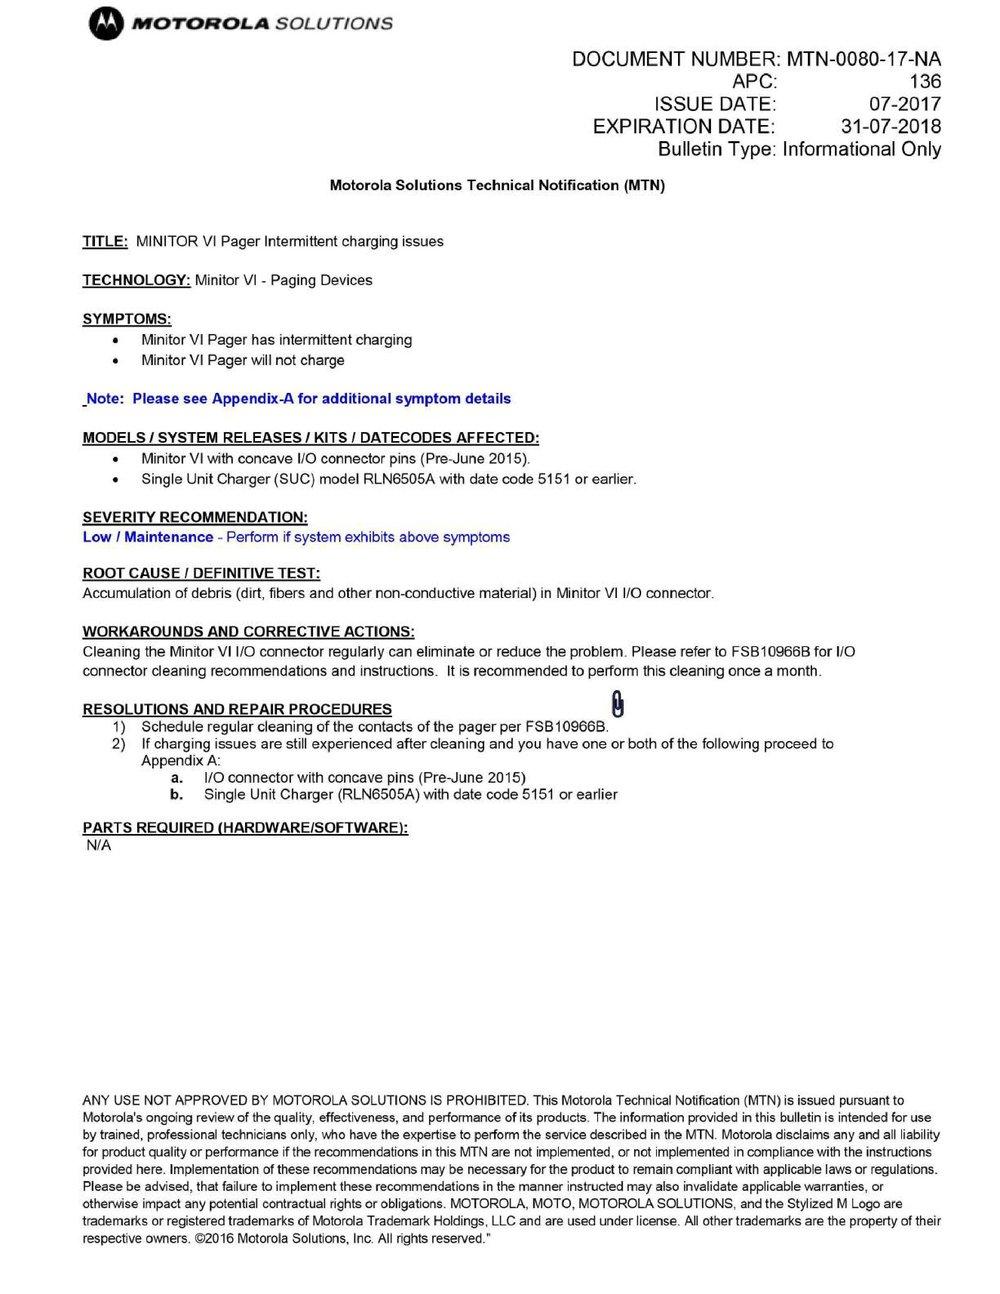 Motorola MTN Instructions_Min_VI Charging_C-page-0.jpg